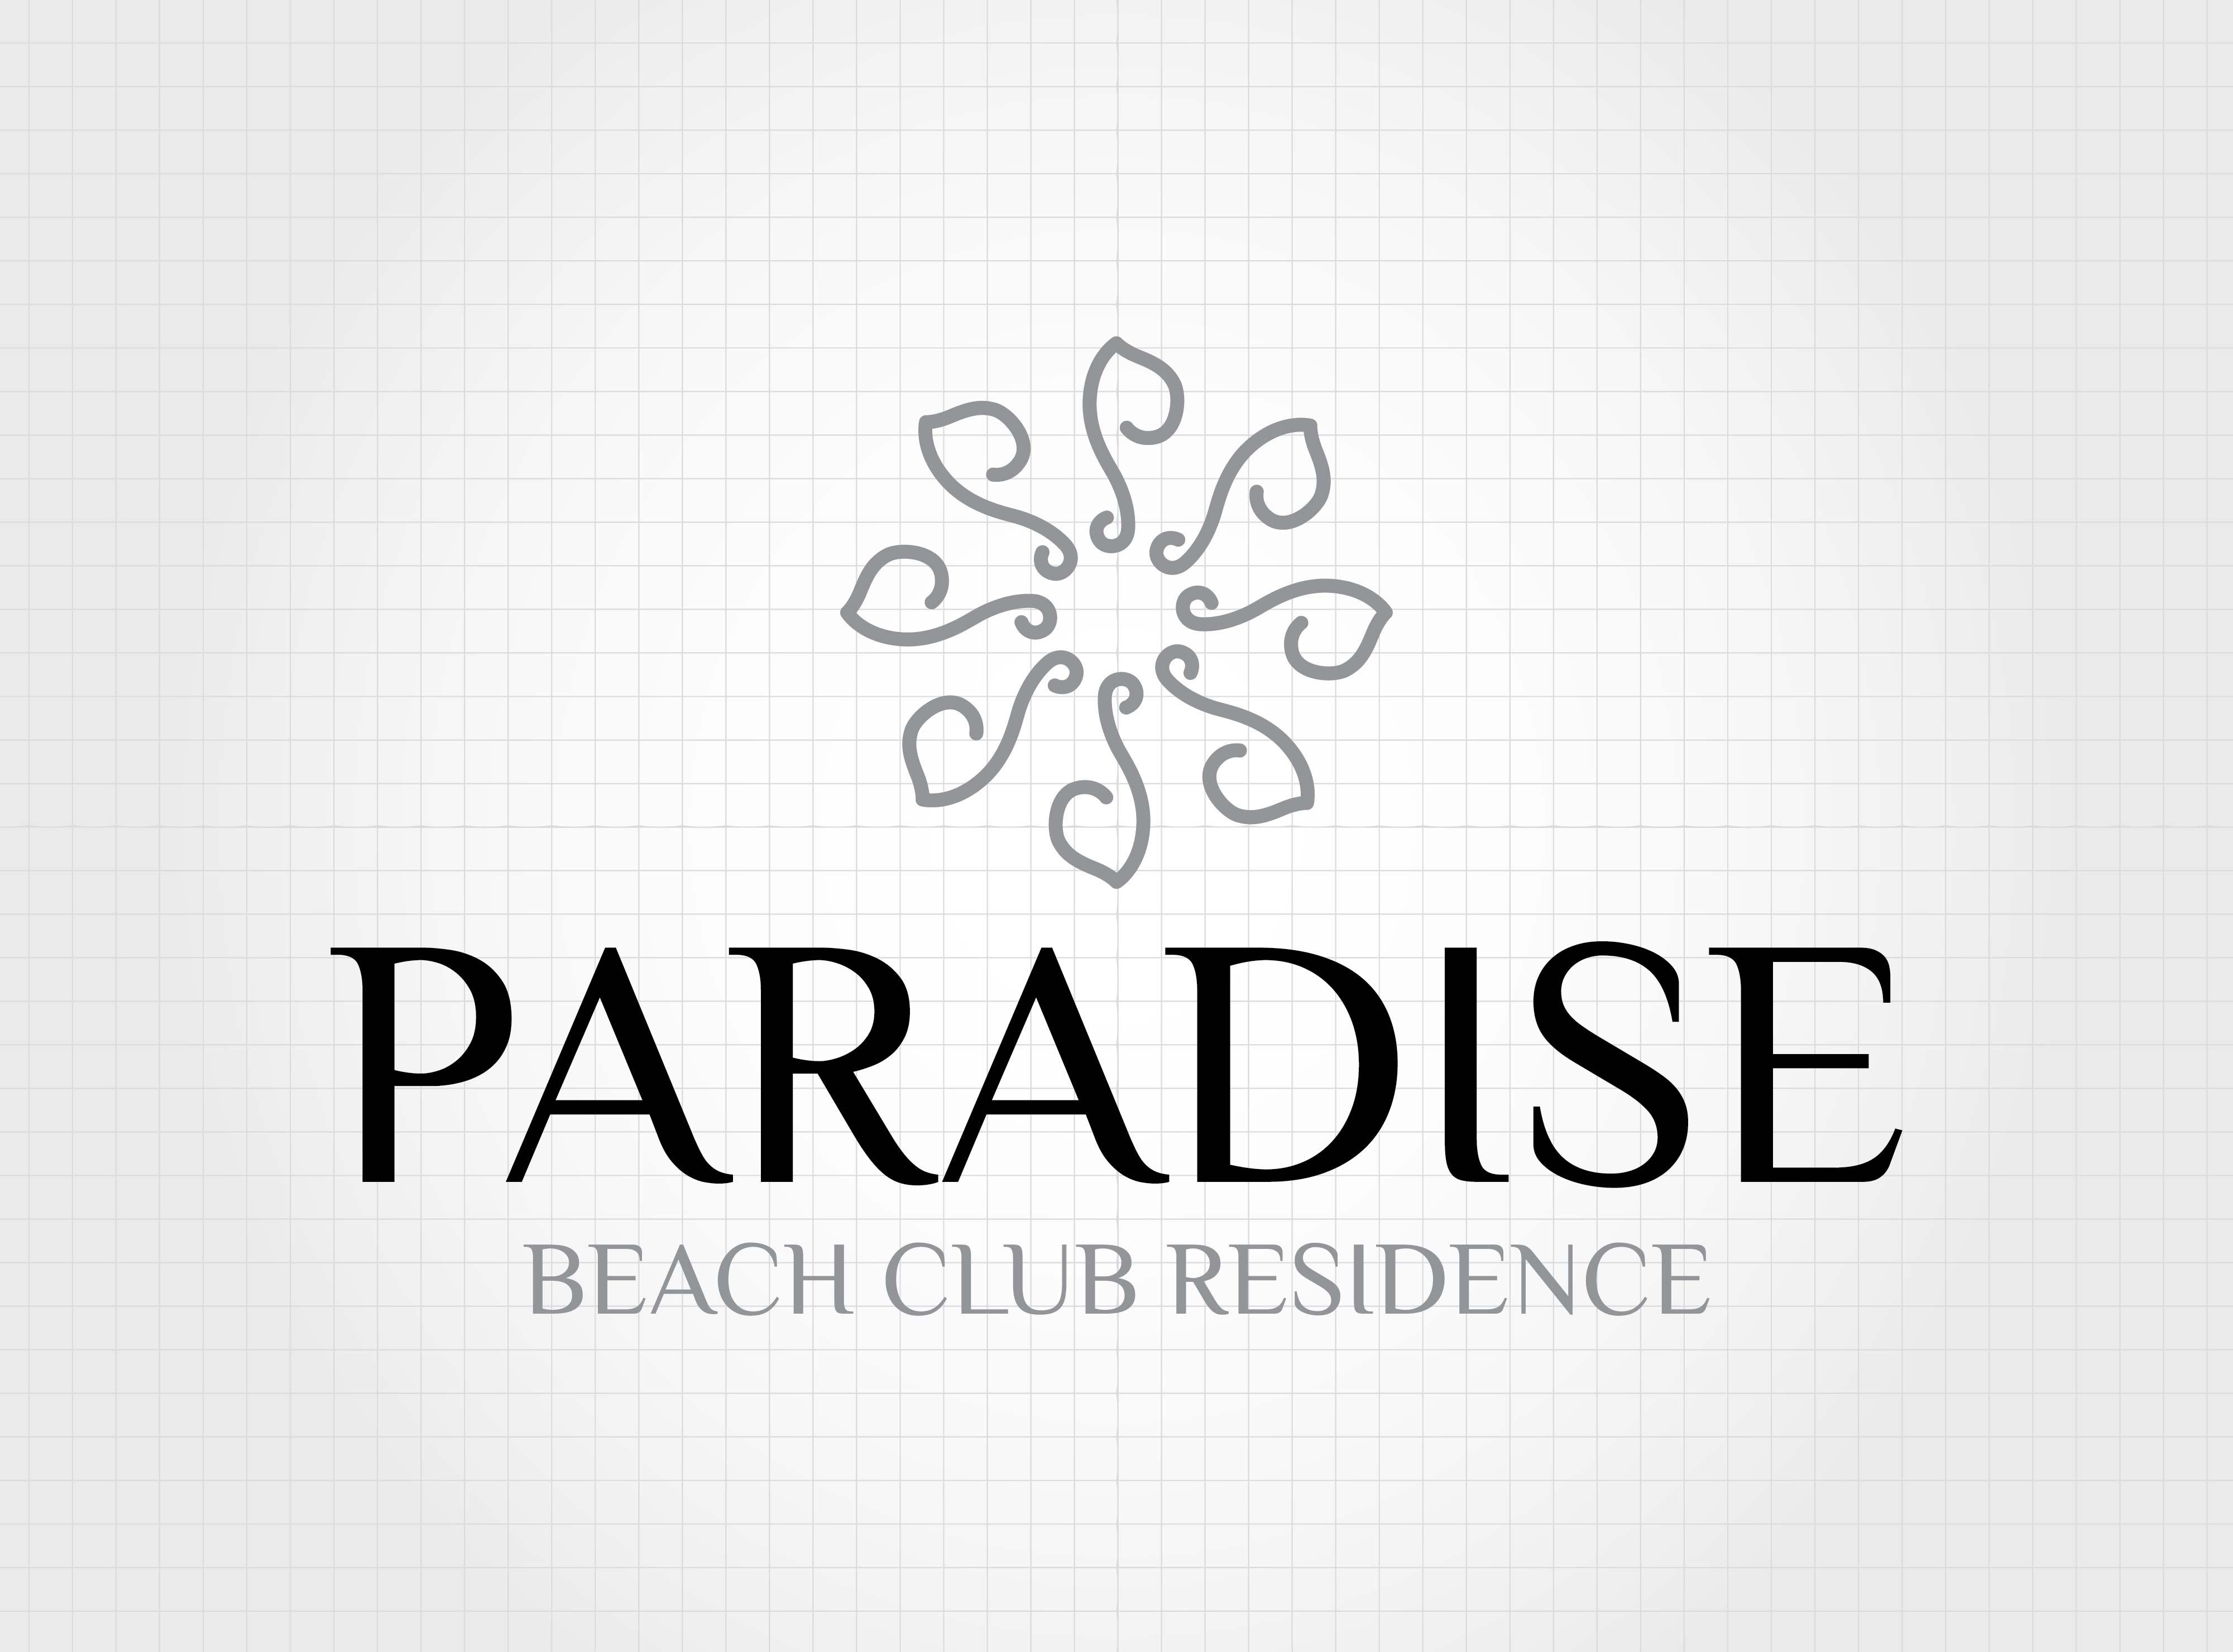 paradise-04